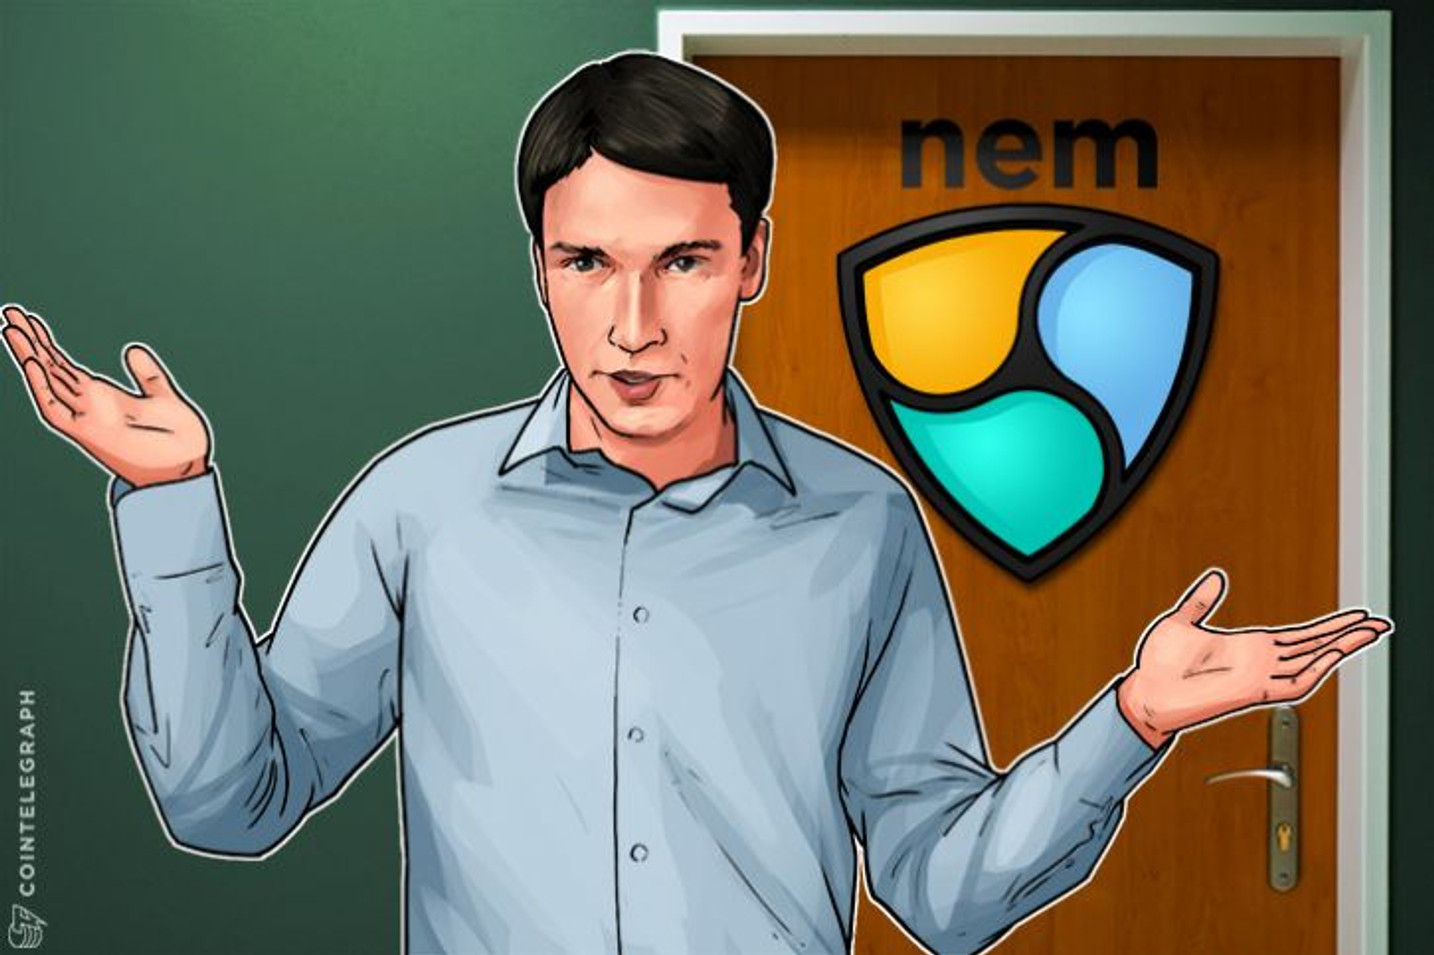 NEM Surpasses Litecoin, Posts 55 Percent Growth on Thursday, 2000 Percent In Two Months